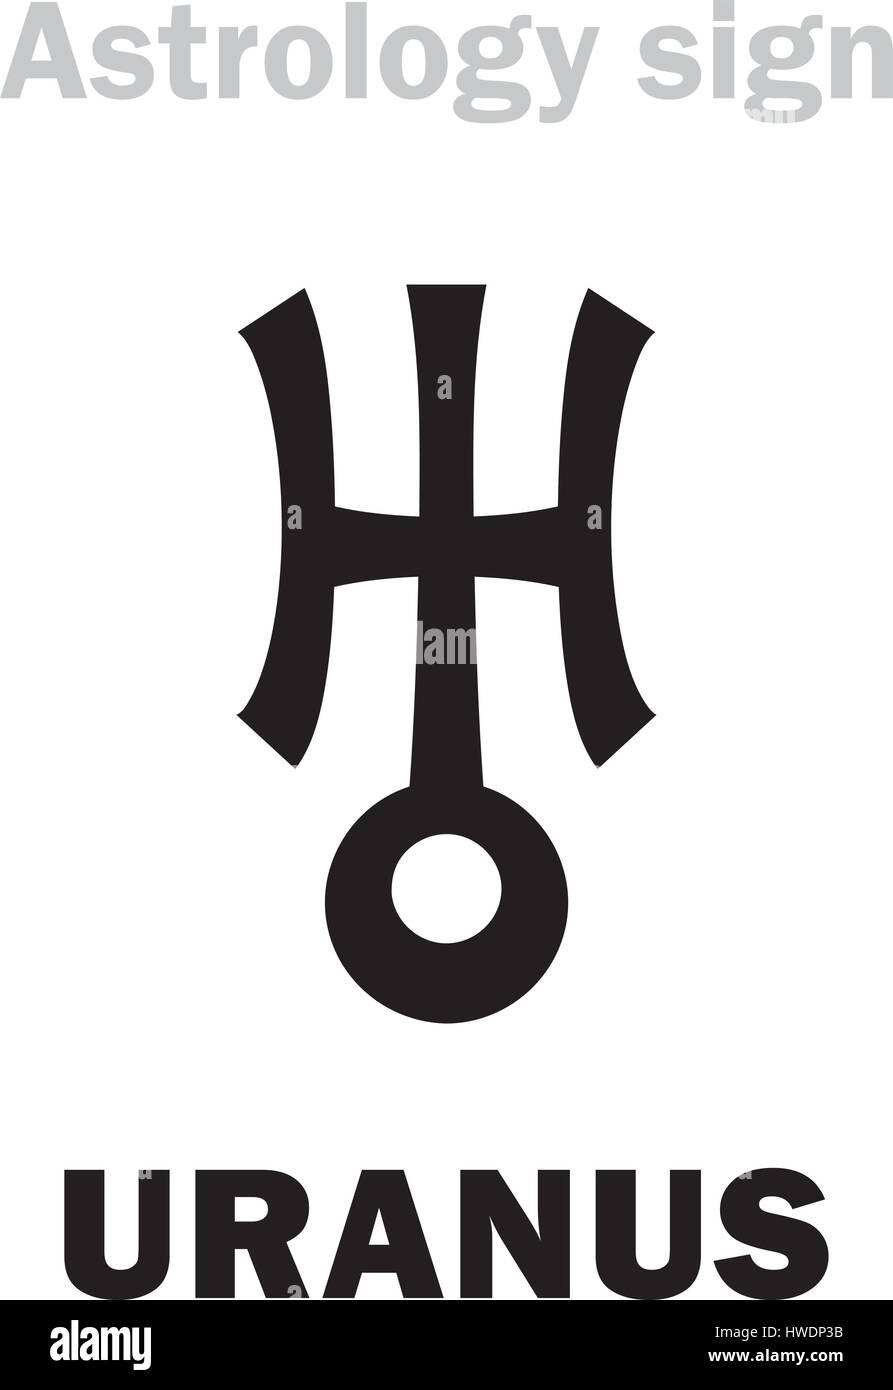 Astrology alphabet uranus herschel higher global planet stock astrology alphabet uranus herschel higher global planet hieroglyphics character sign single symbol buycottarizona